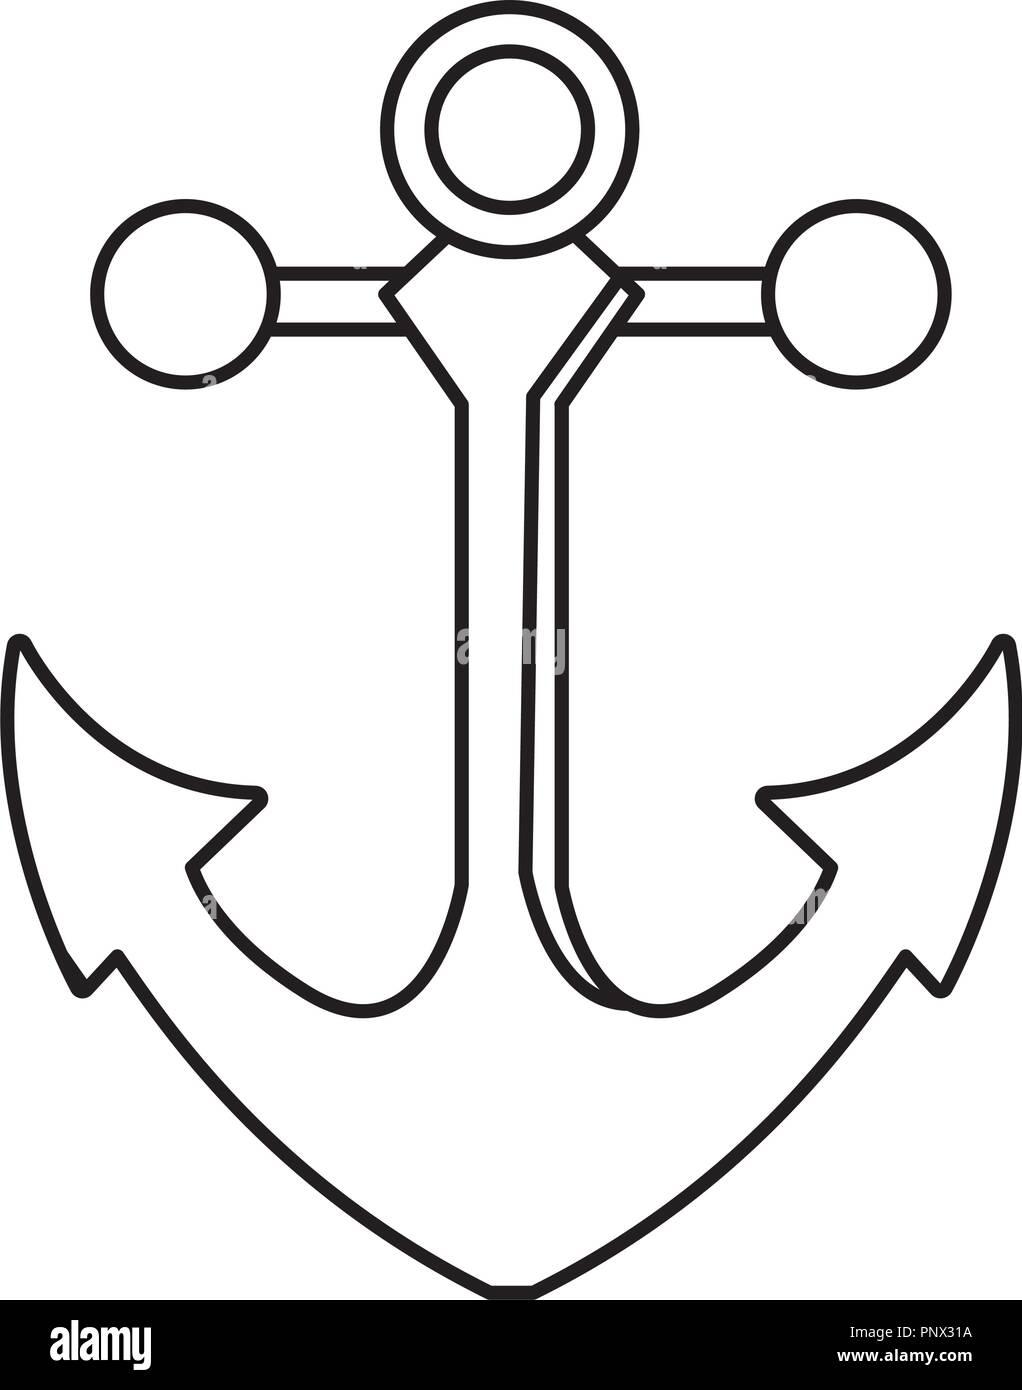 49ee93a21 outline metal anchor equipment nautical security Stock Vector Art ...